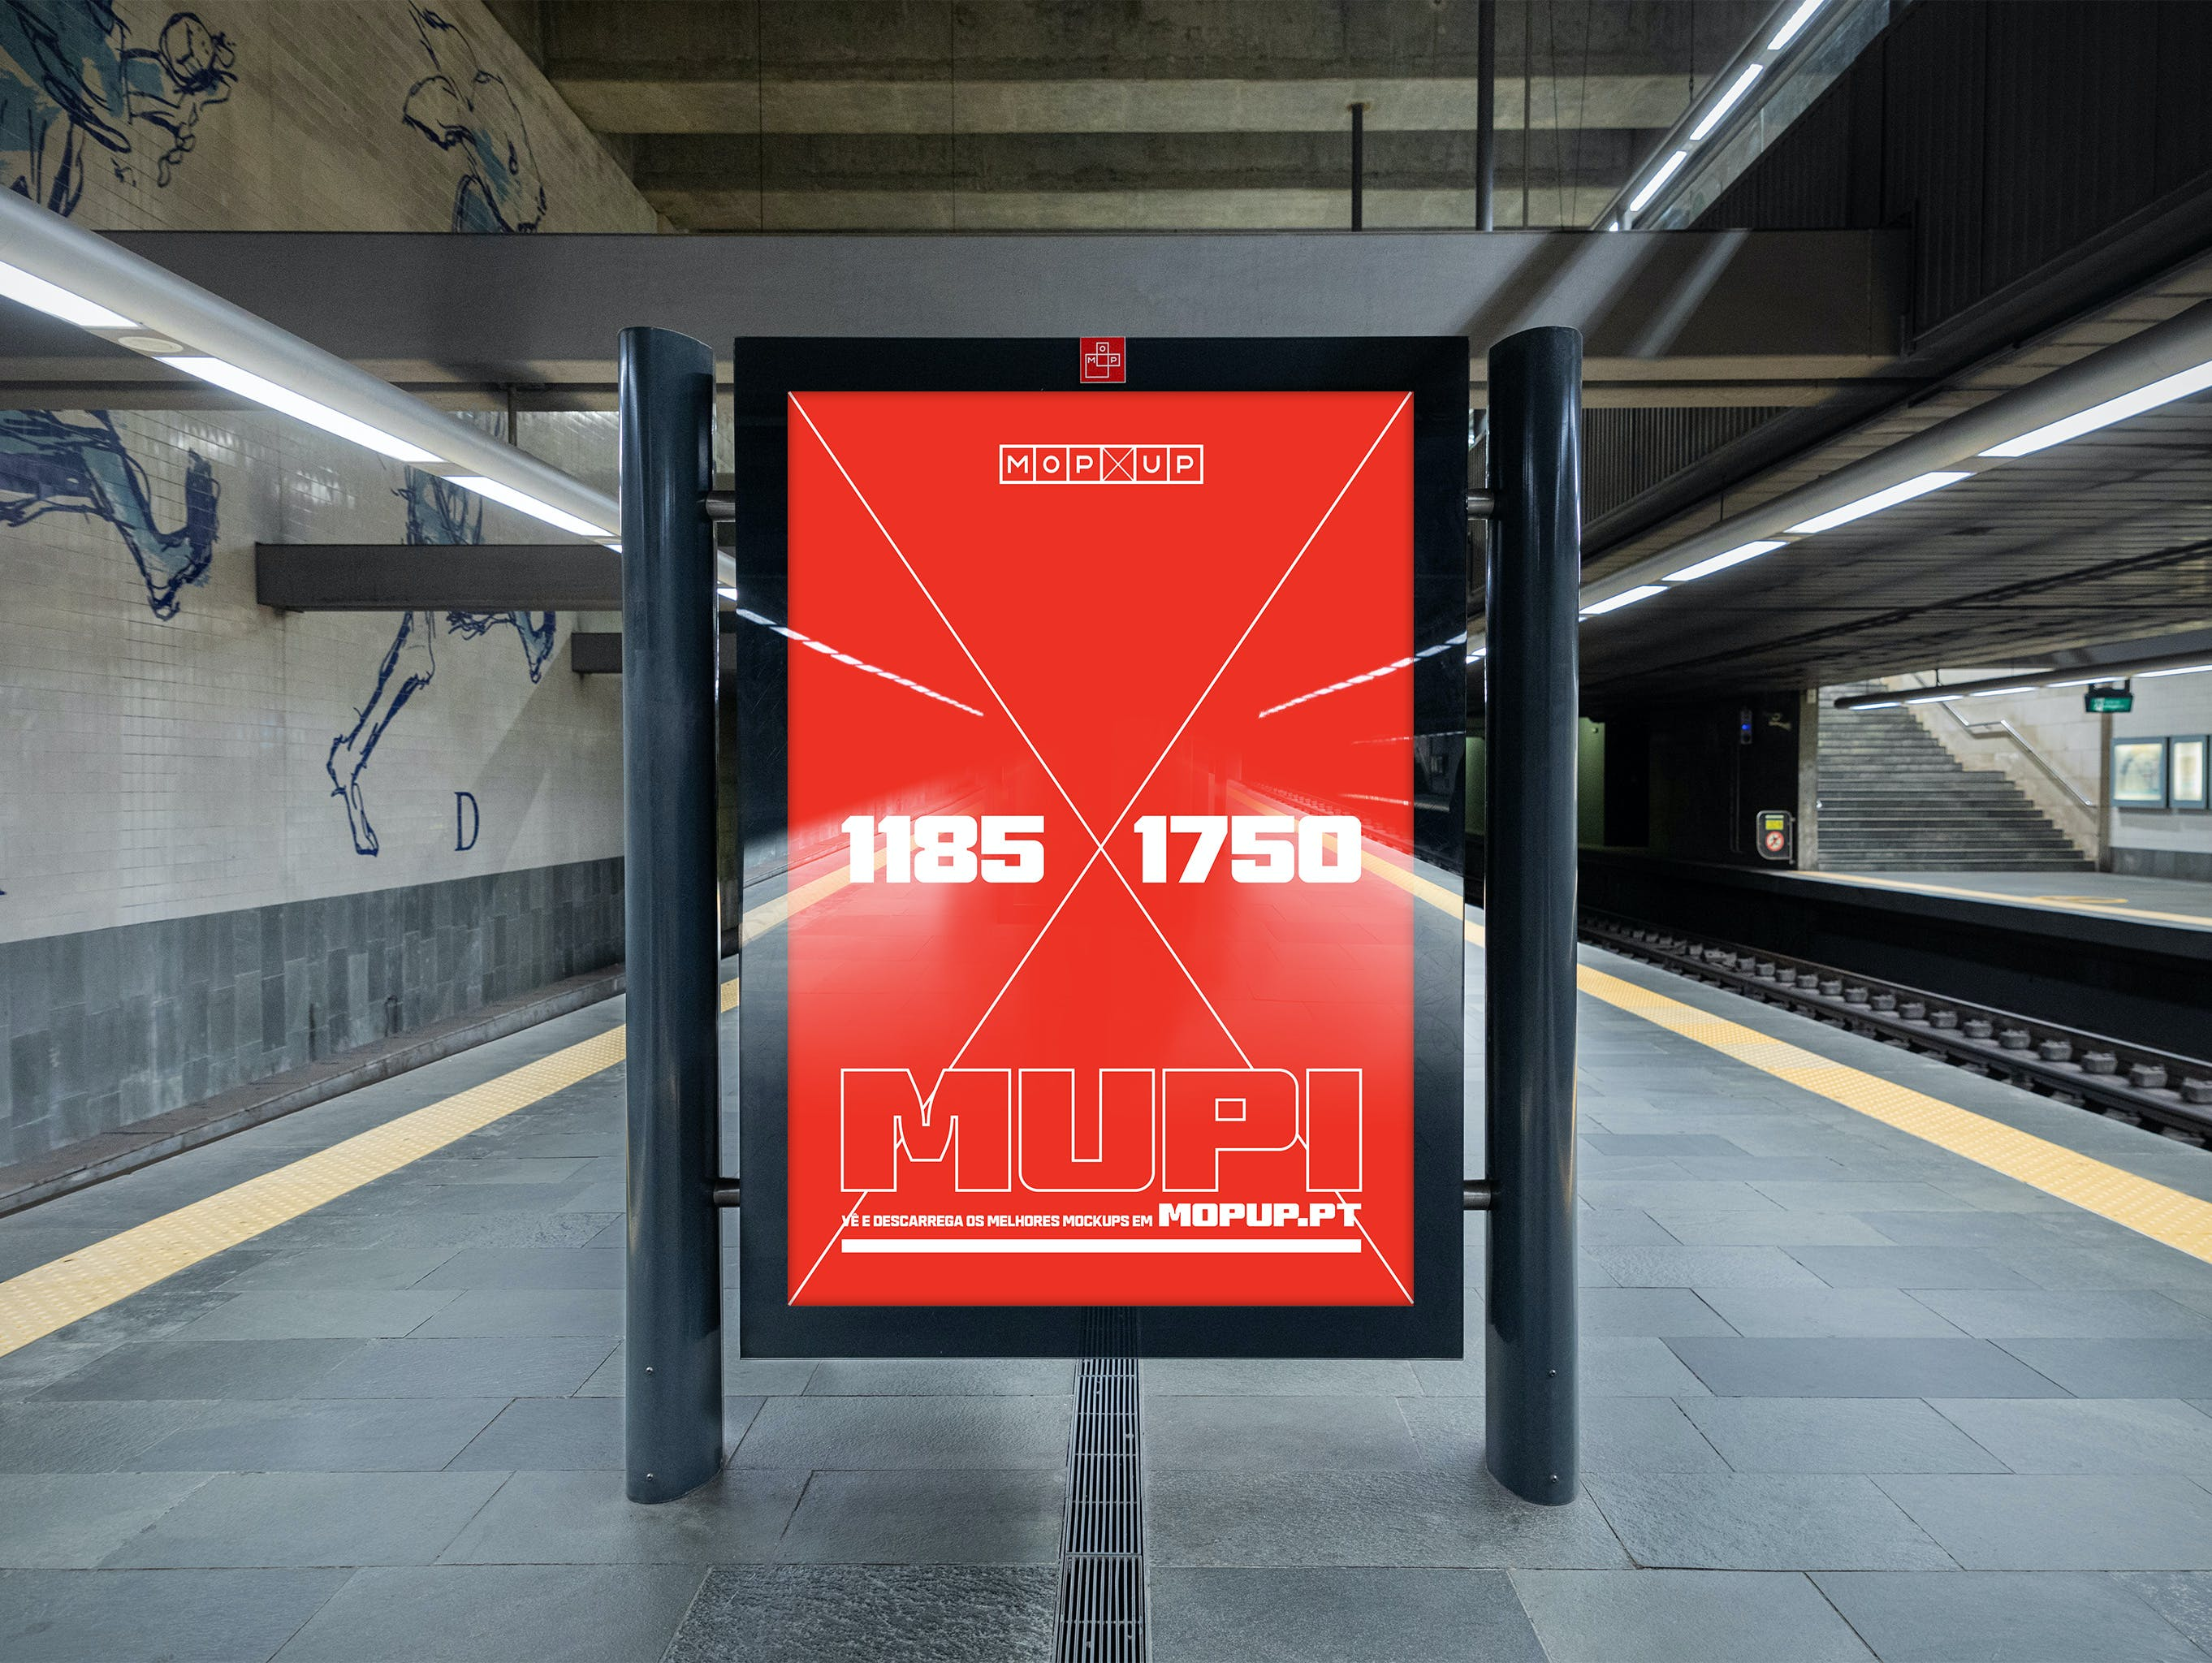 MOPUP - Mupi Metro Cais do Sodré 2 - Mockup